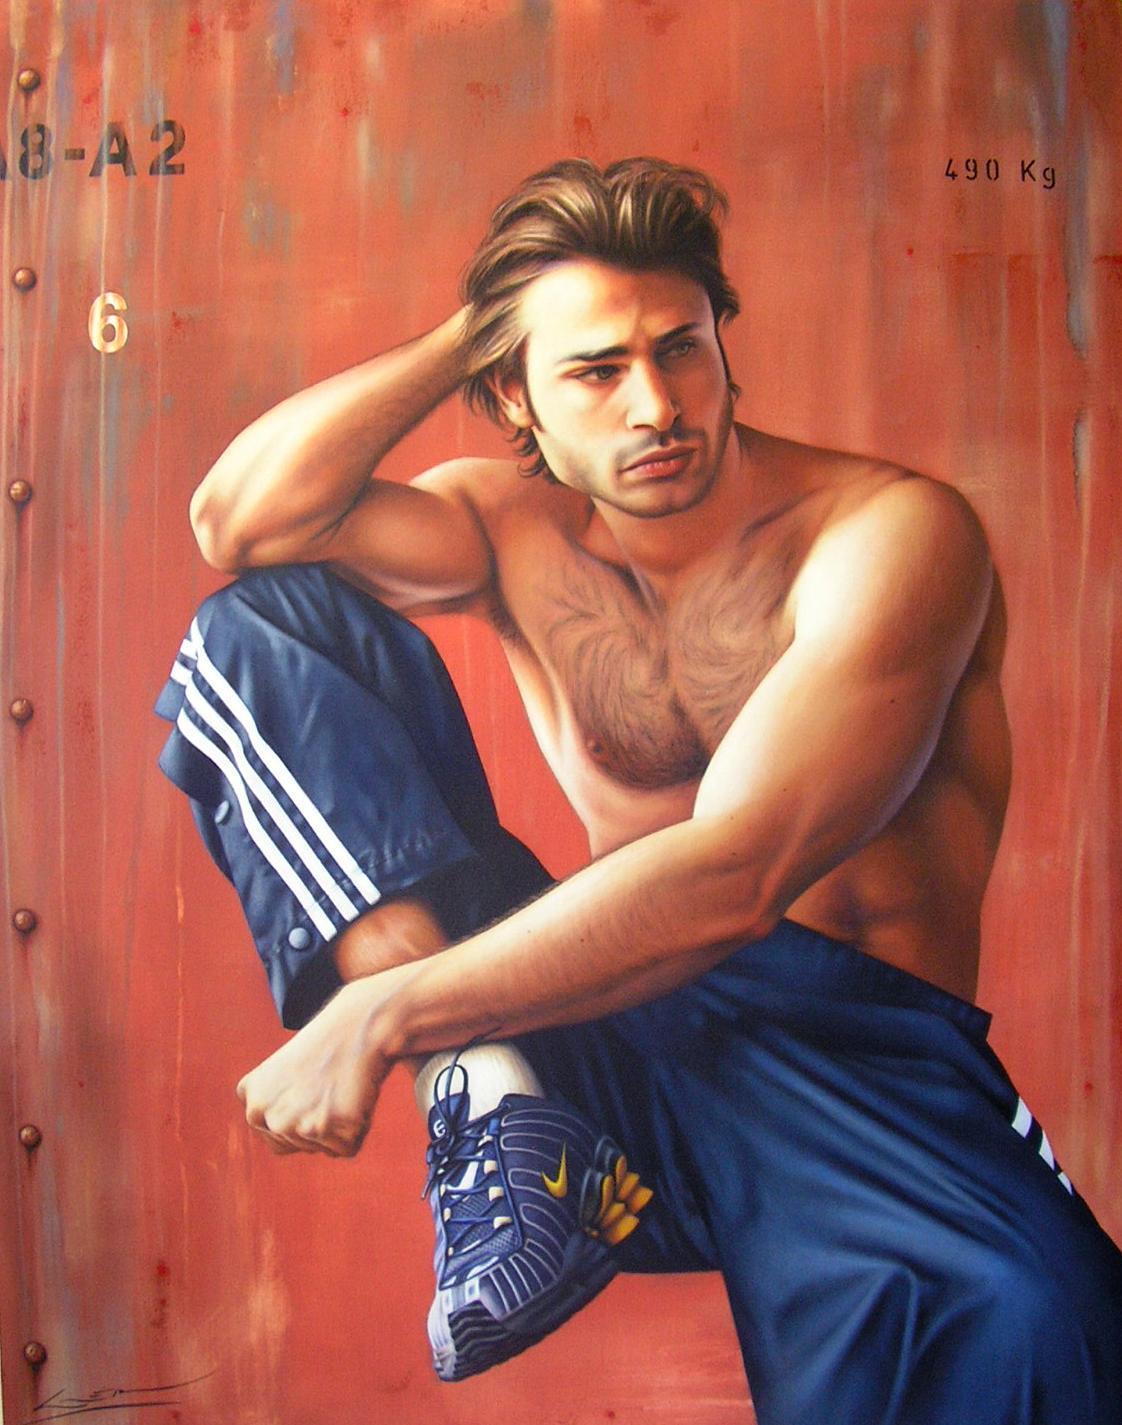 PENSADOR by Mr. LAZER FUNDORA - Masterpiece Online